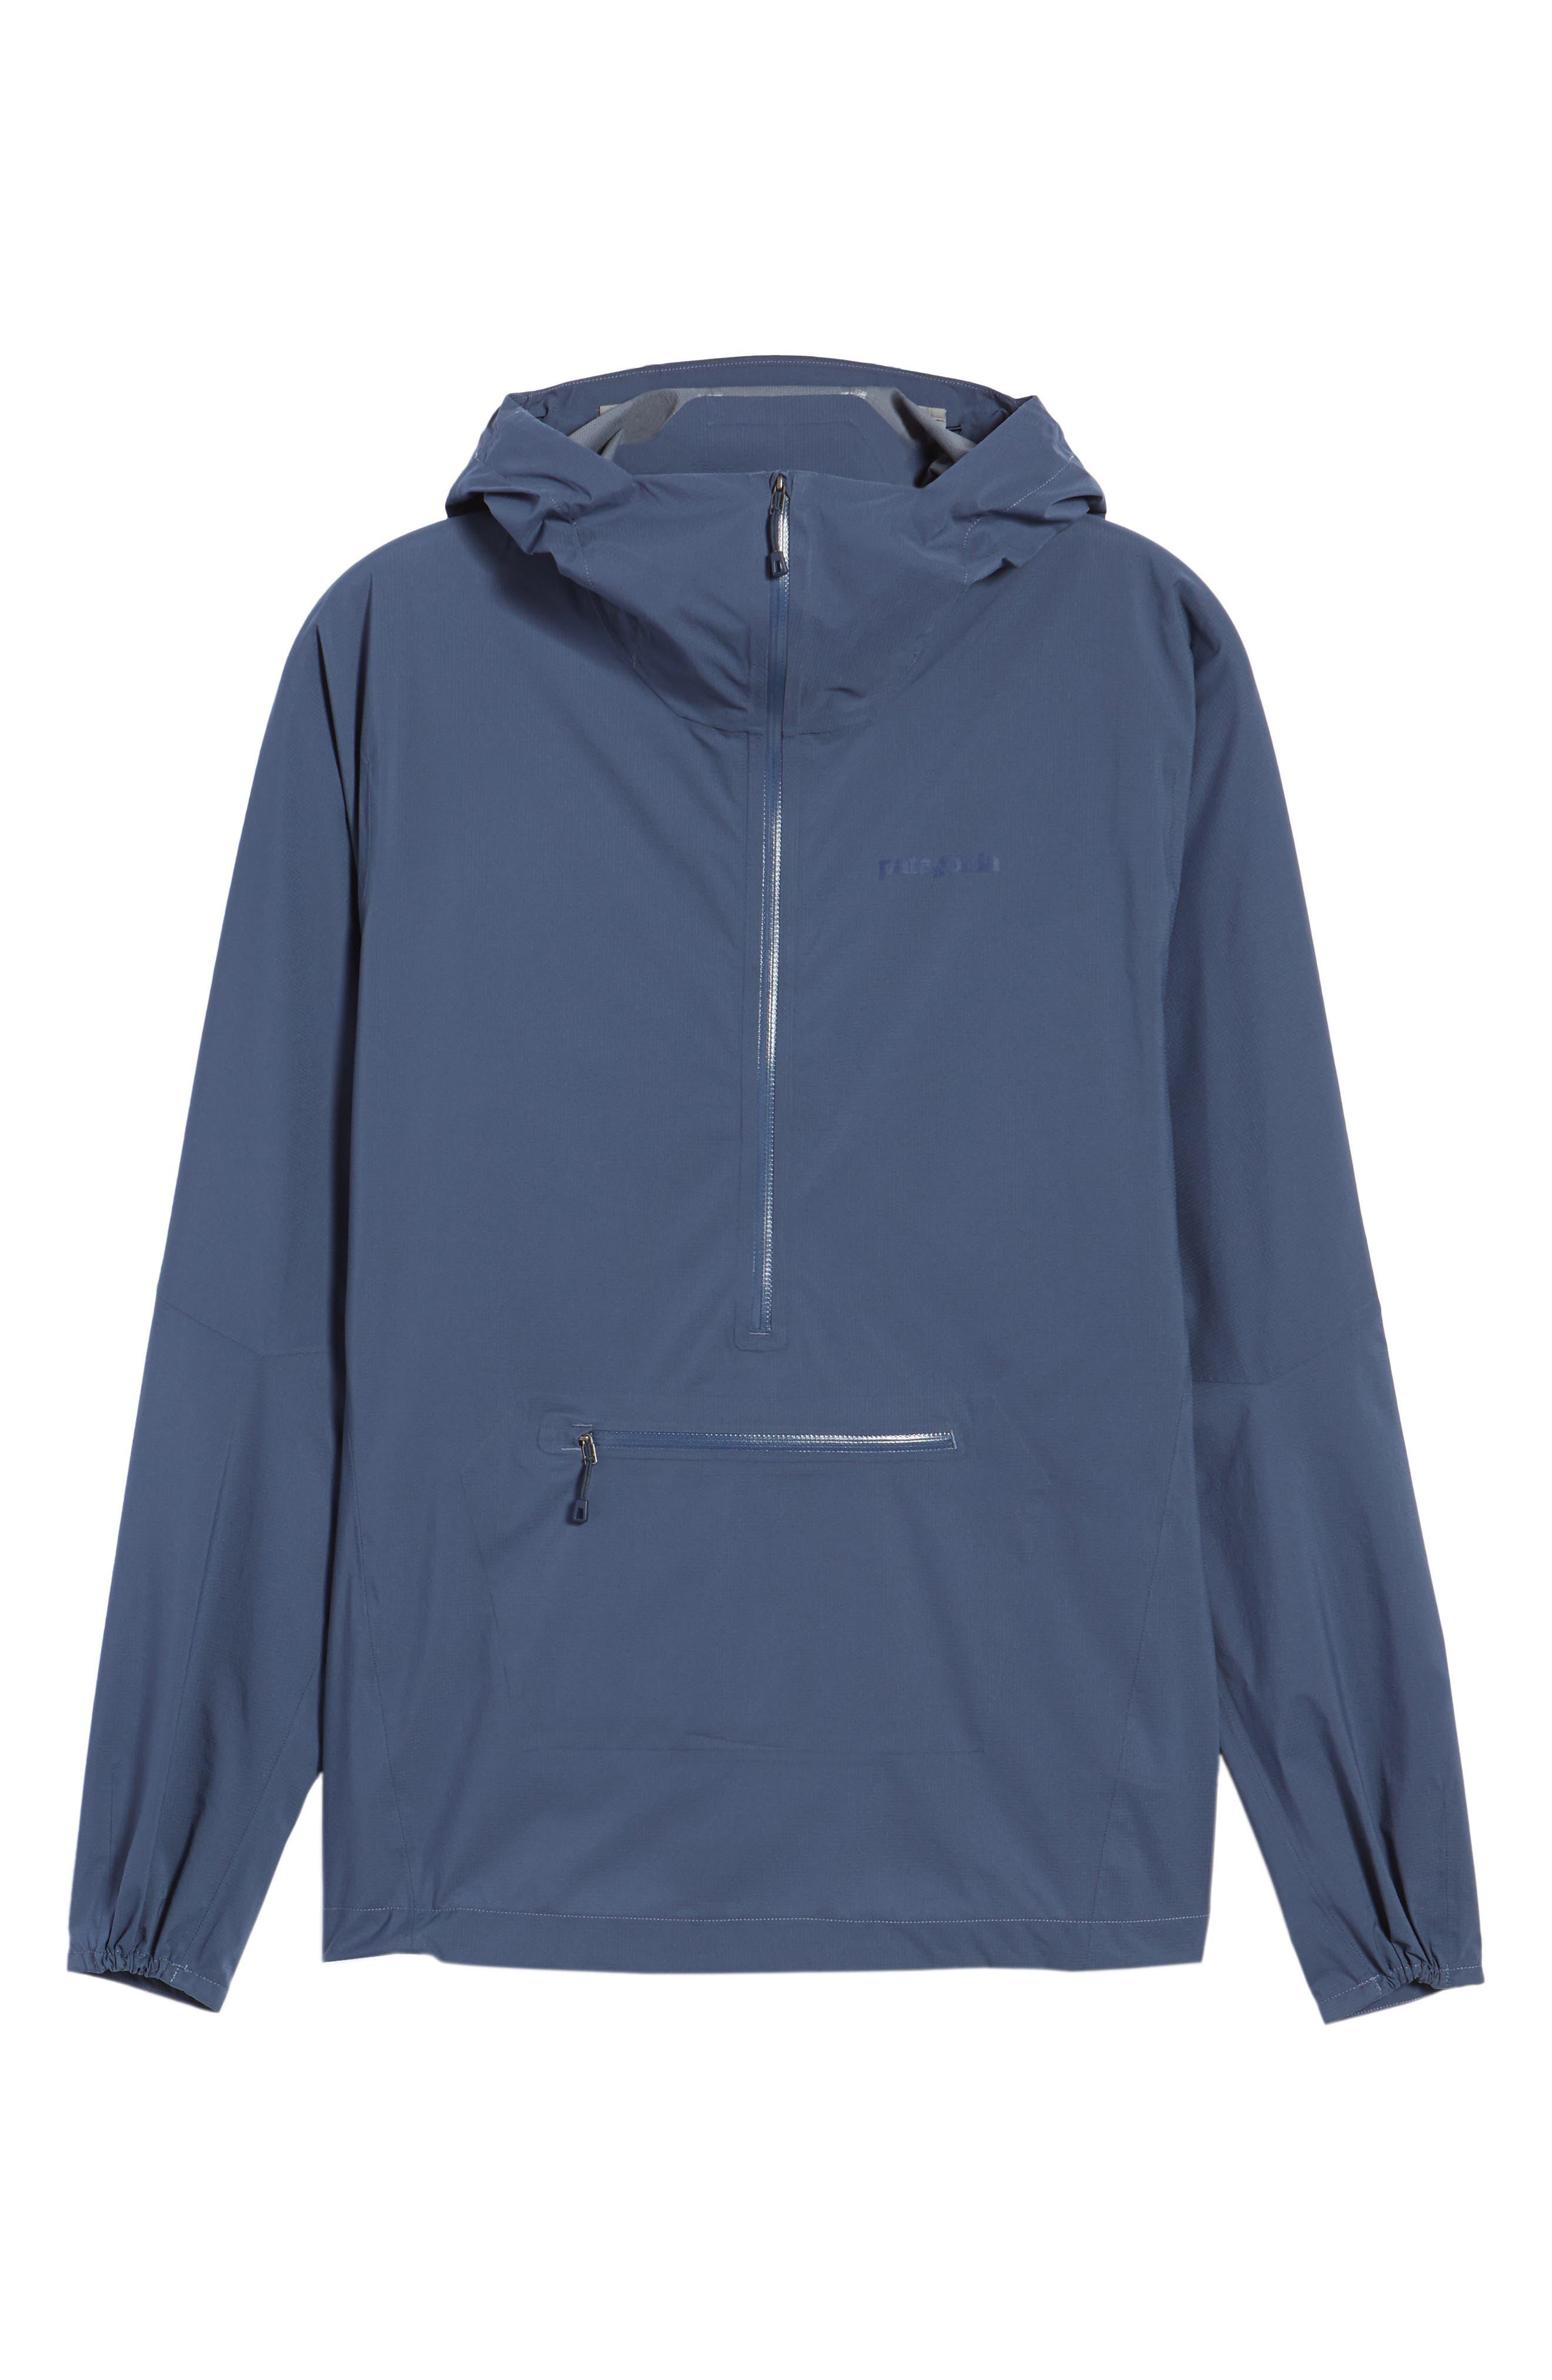 Stretch Rainshadow Jacket,                             Alternate thumbnail 6, color,                             Dolomite Blue